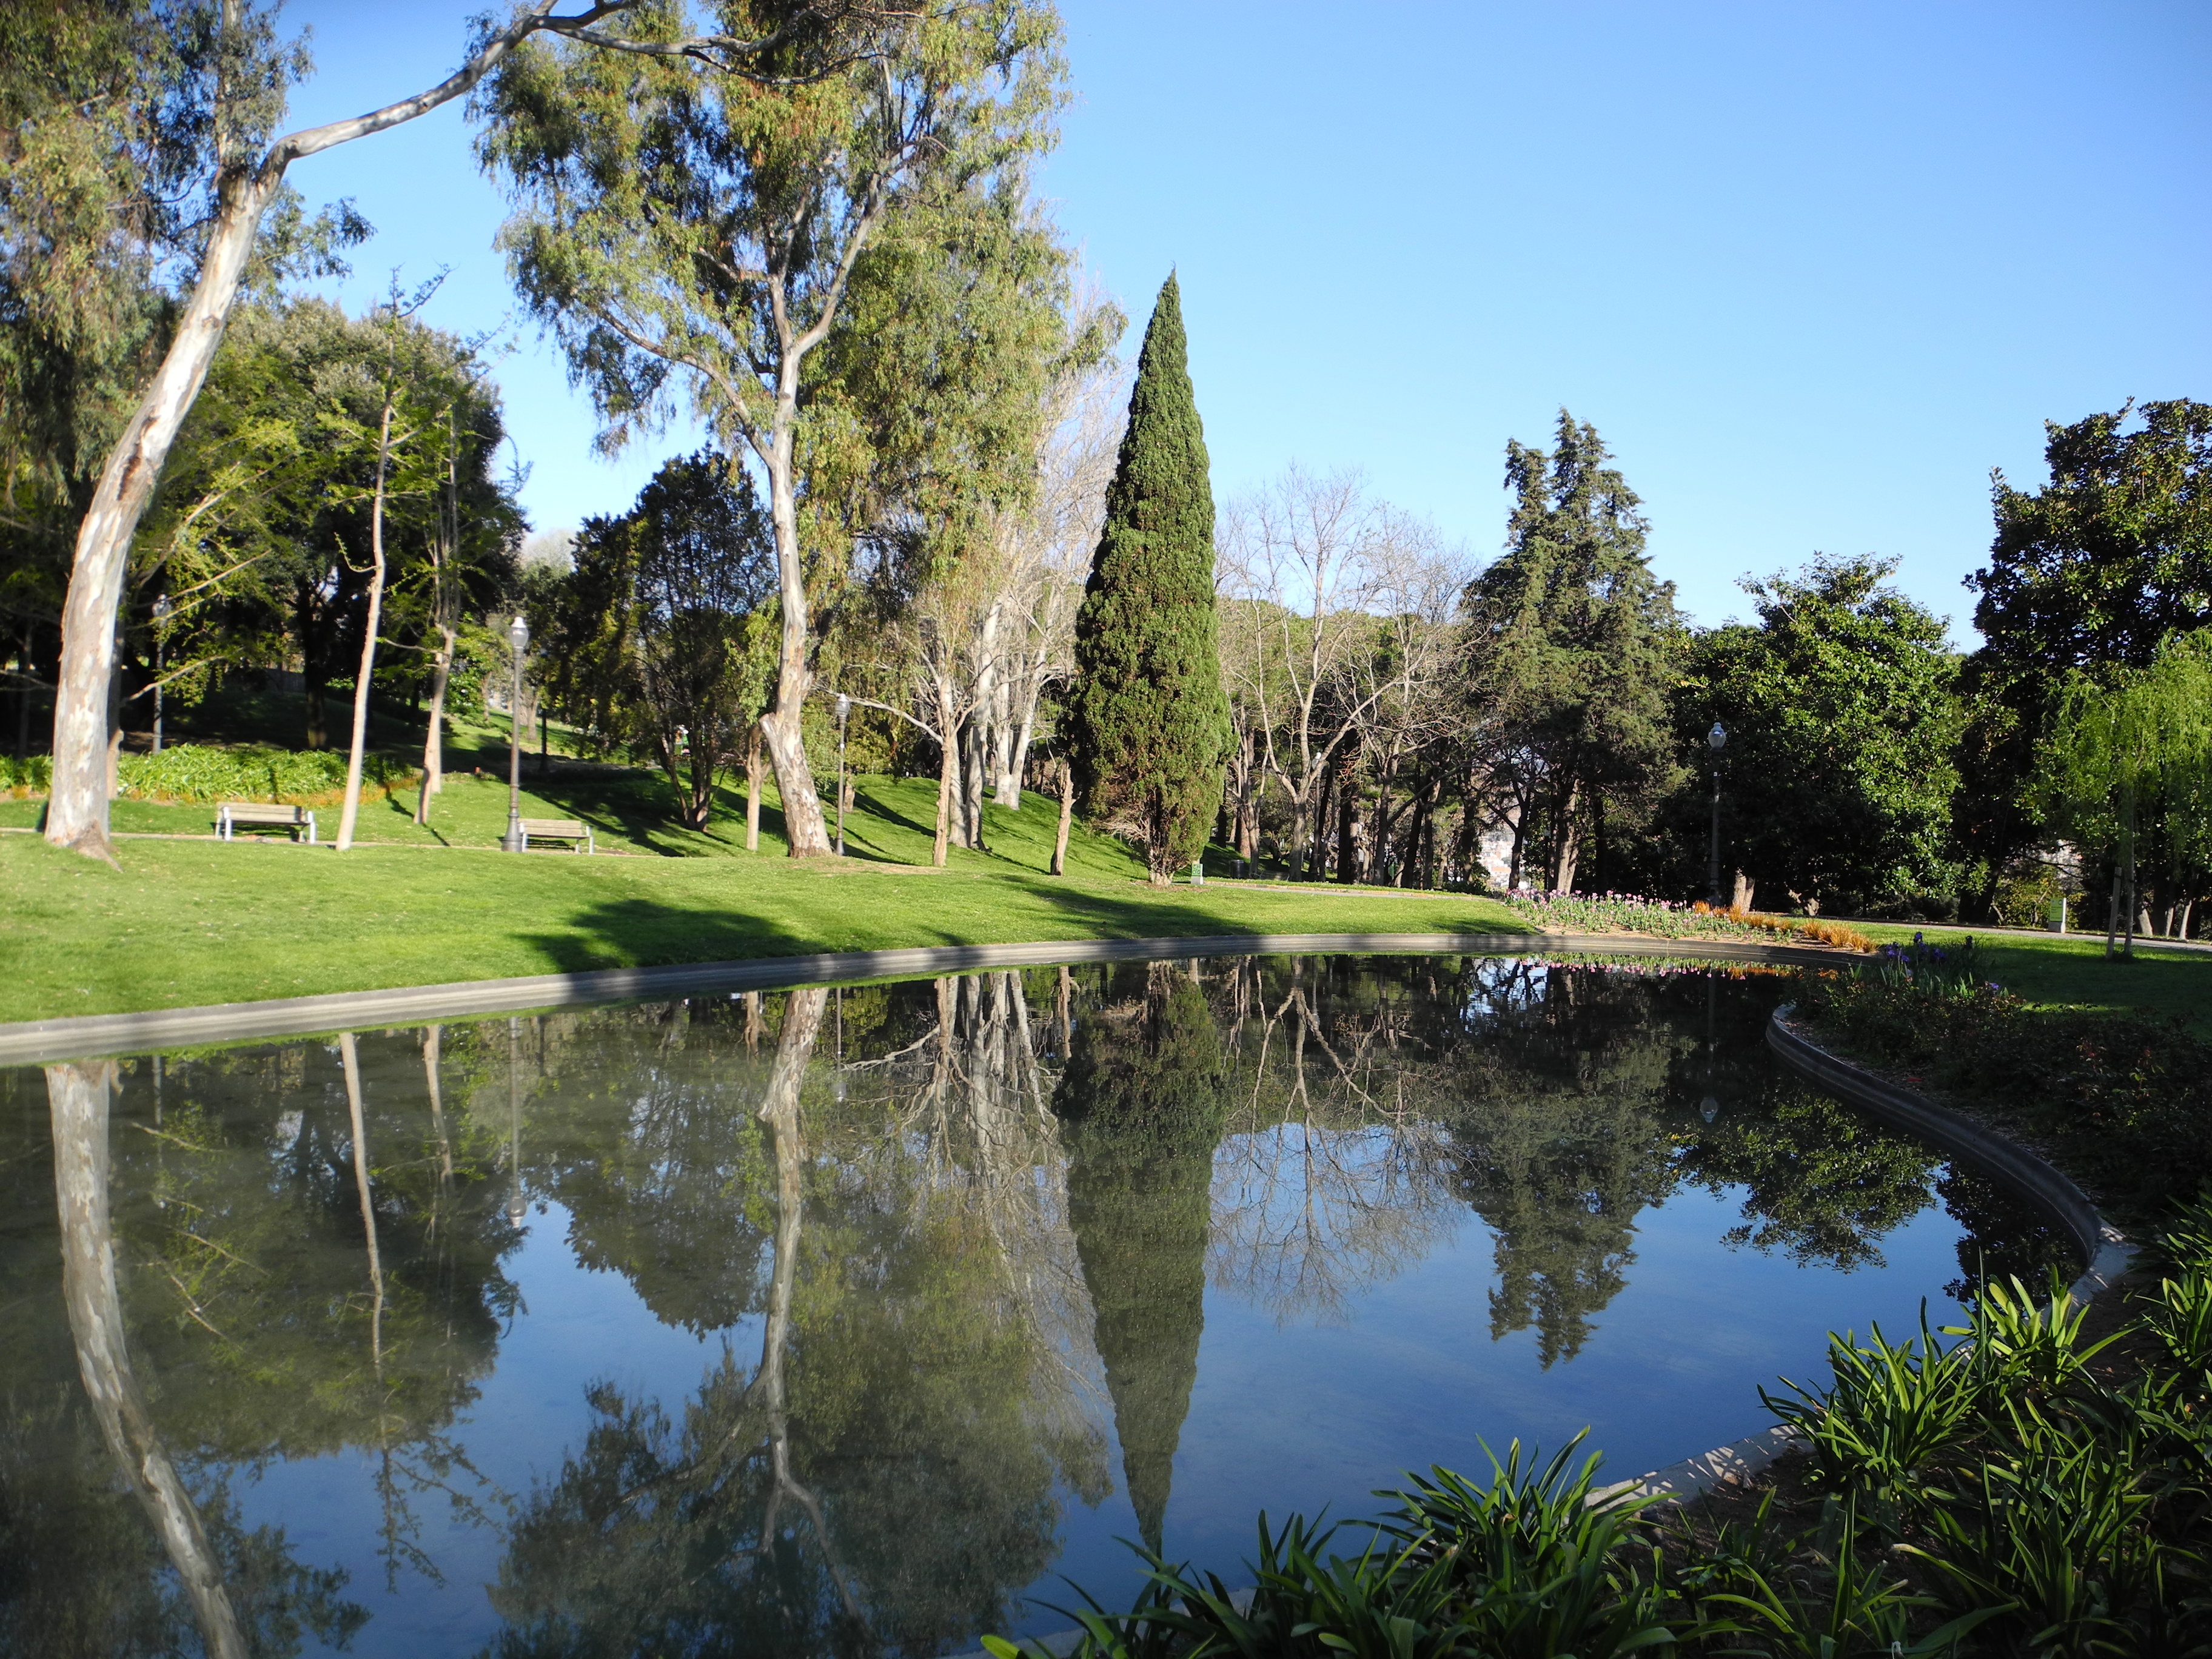 Jardines de barcelona fotos de naturaleza - Jardines de barcelona ...